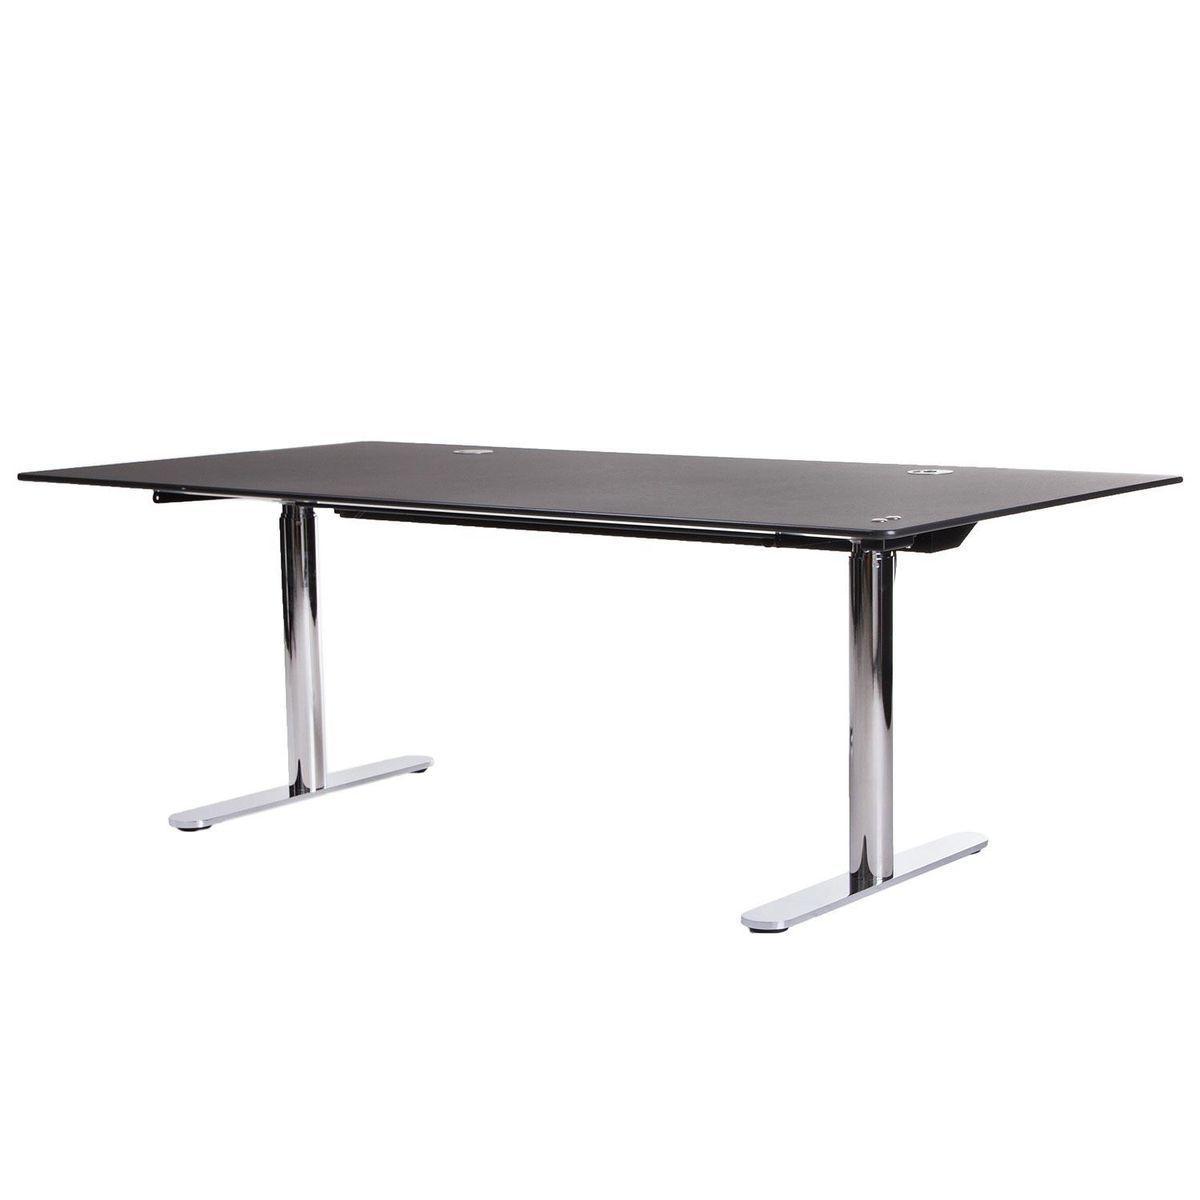 HA2 Work Height Adjustable Office Table Montana AmbienteDirectcom